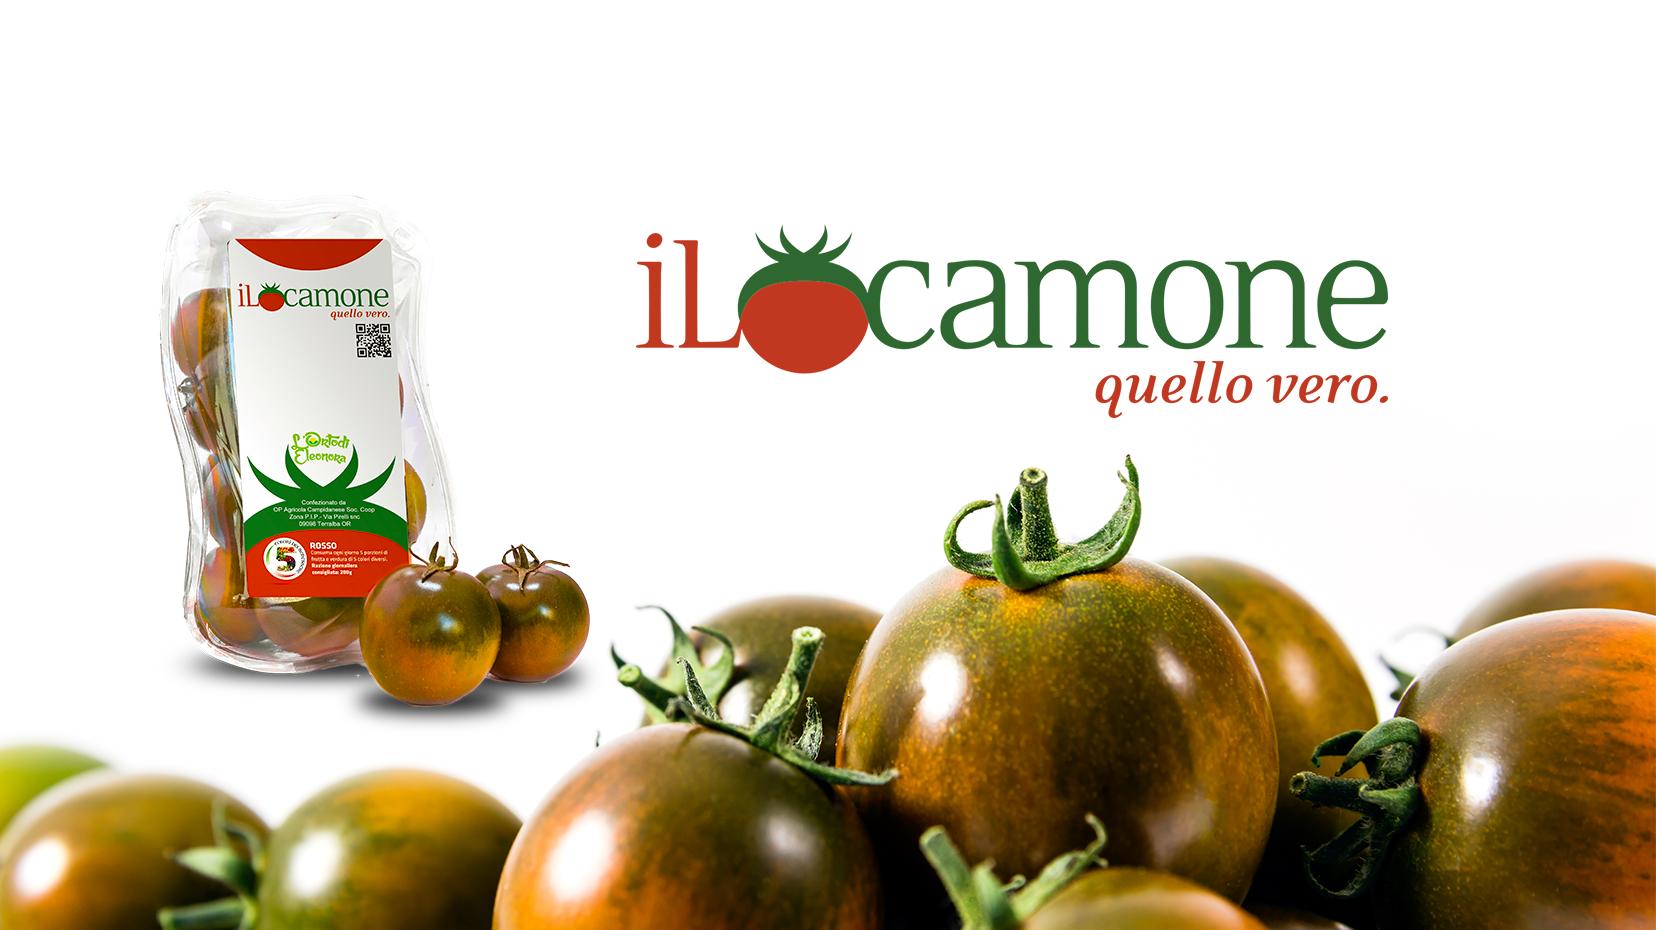 Agricola Campidanese iLcamone